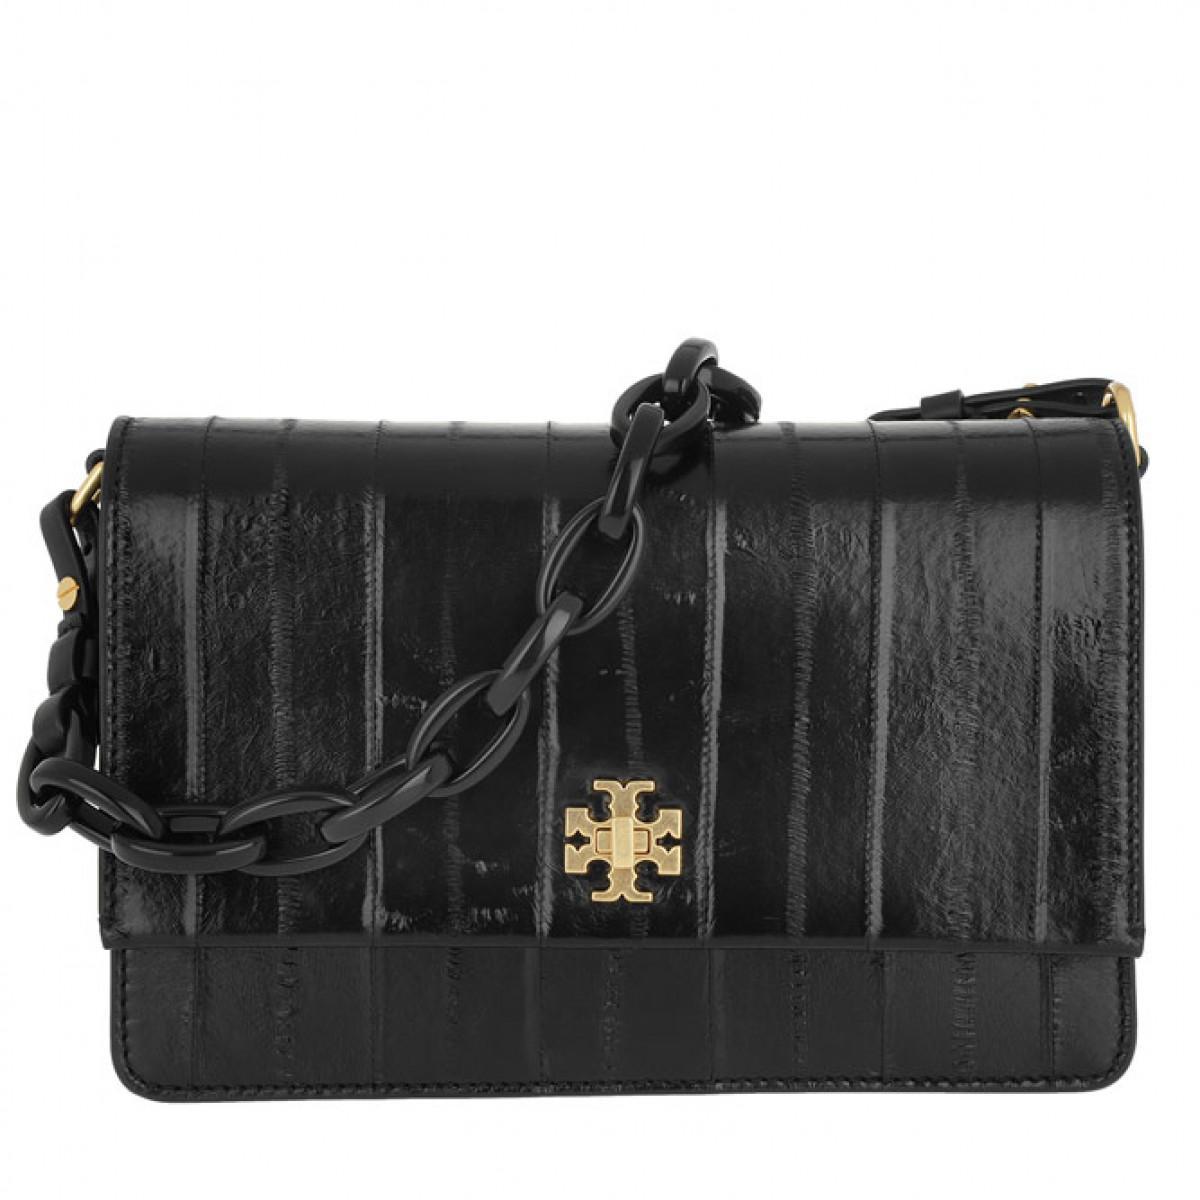 da9481c060f3 Tory Burch Kira Eel Double-strap Shoulder Bag Black in Black - Lyst